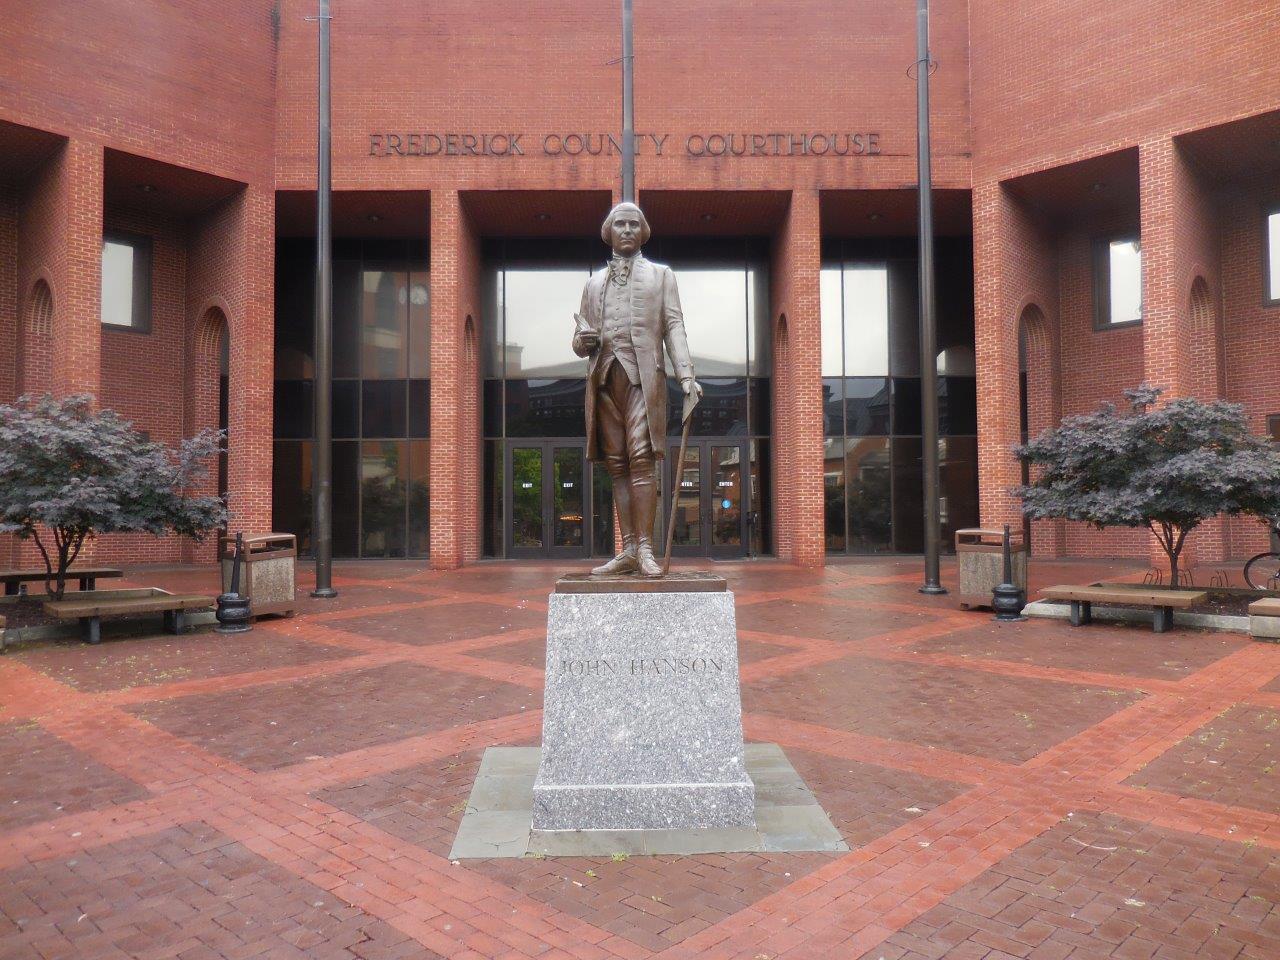 John Hanson memorial in Frederick, Maryland